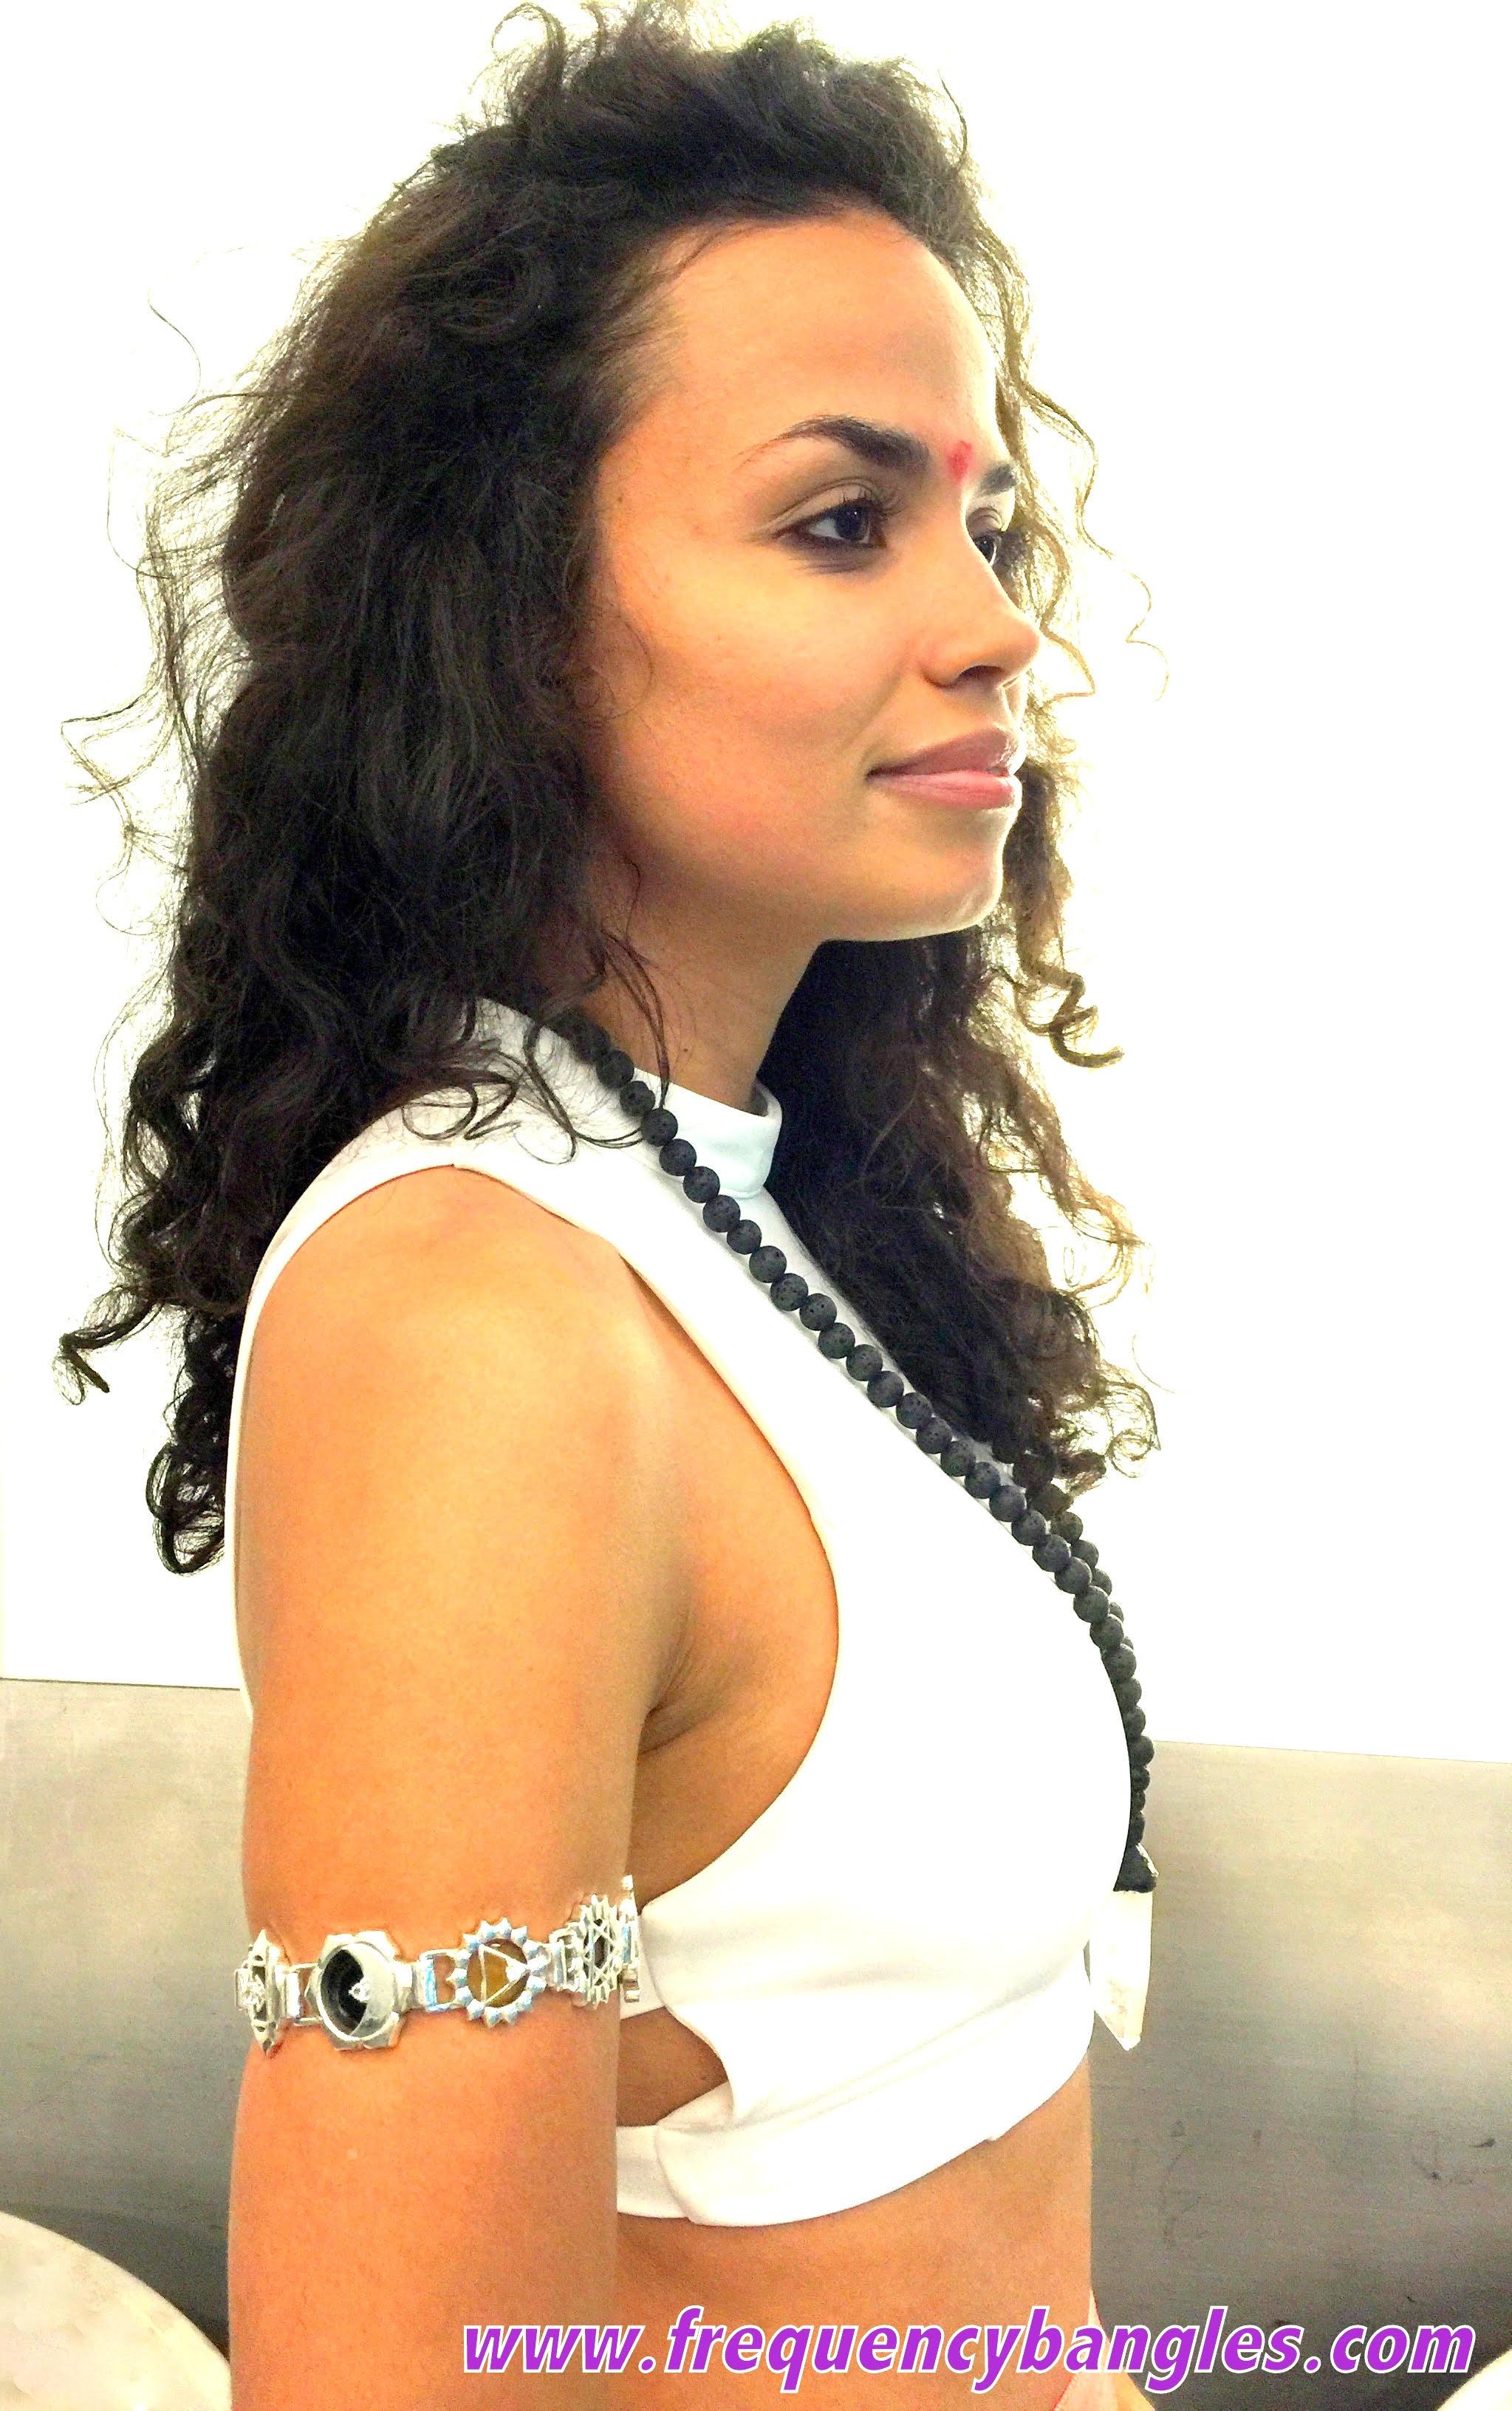 lady wearing the bangle